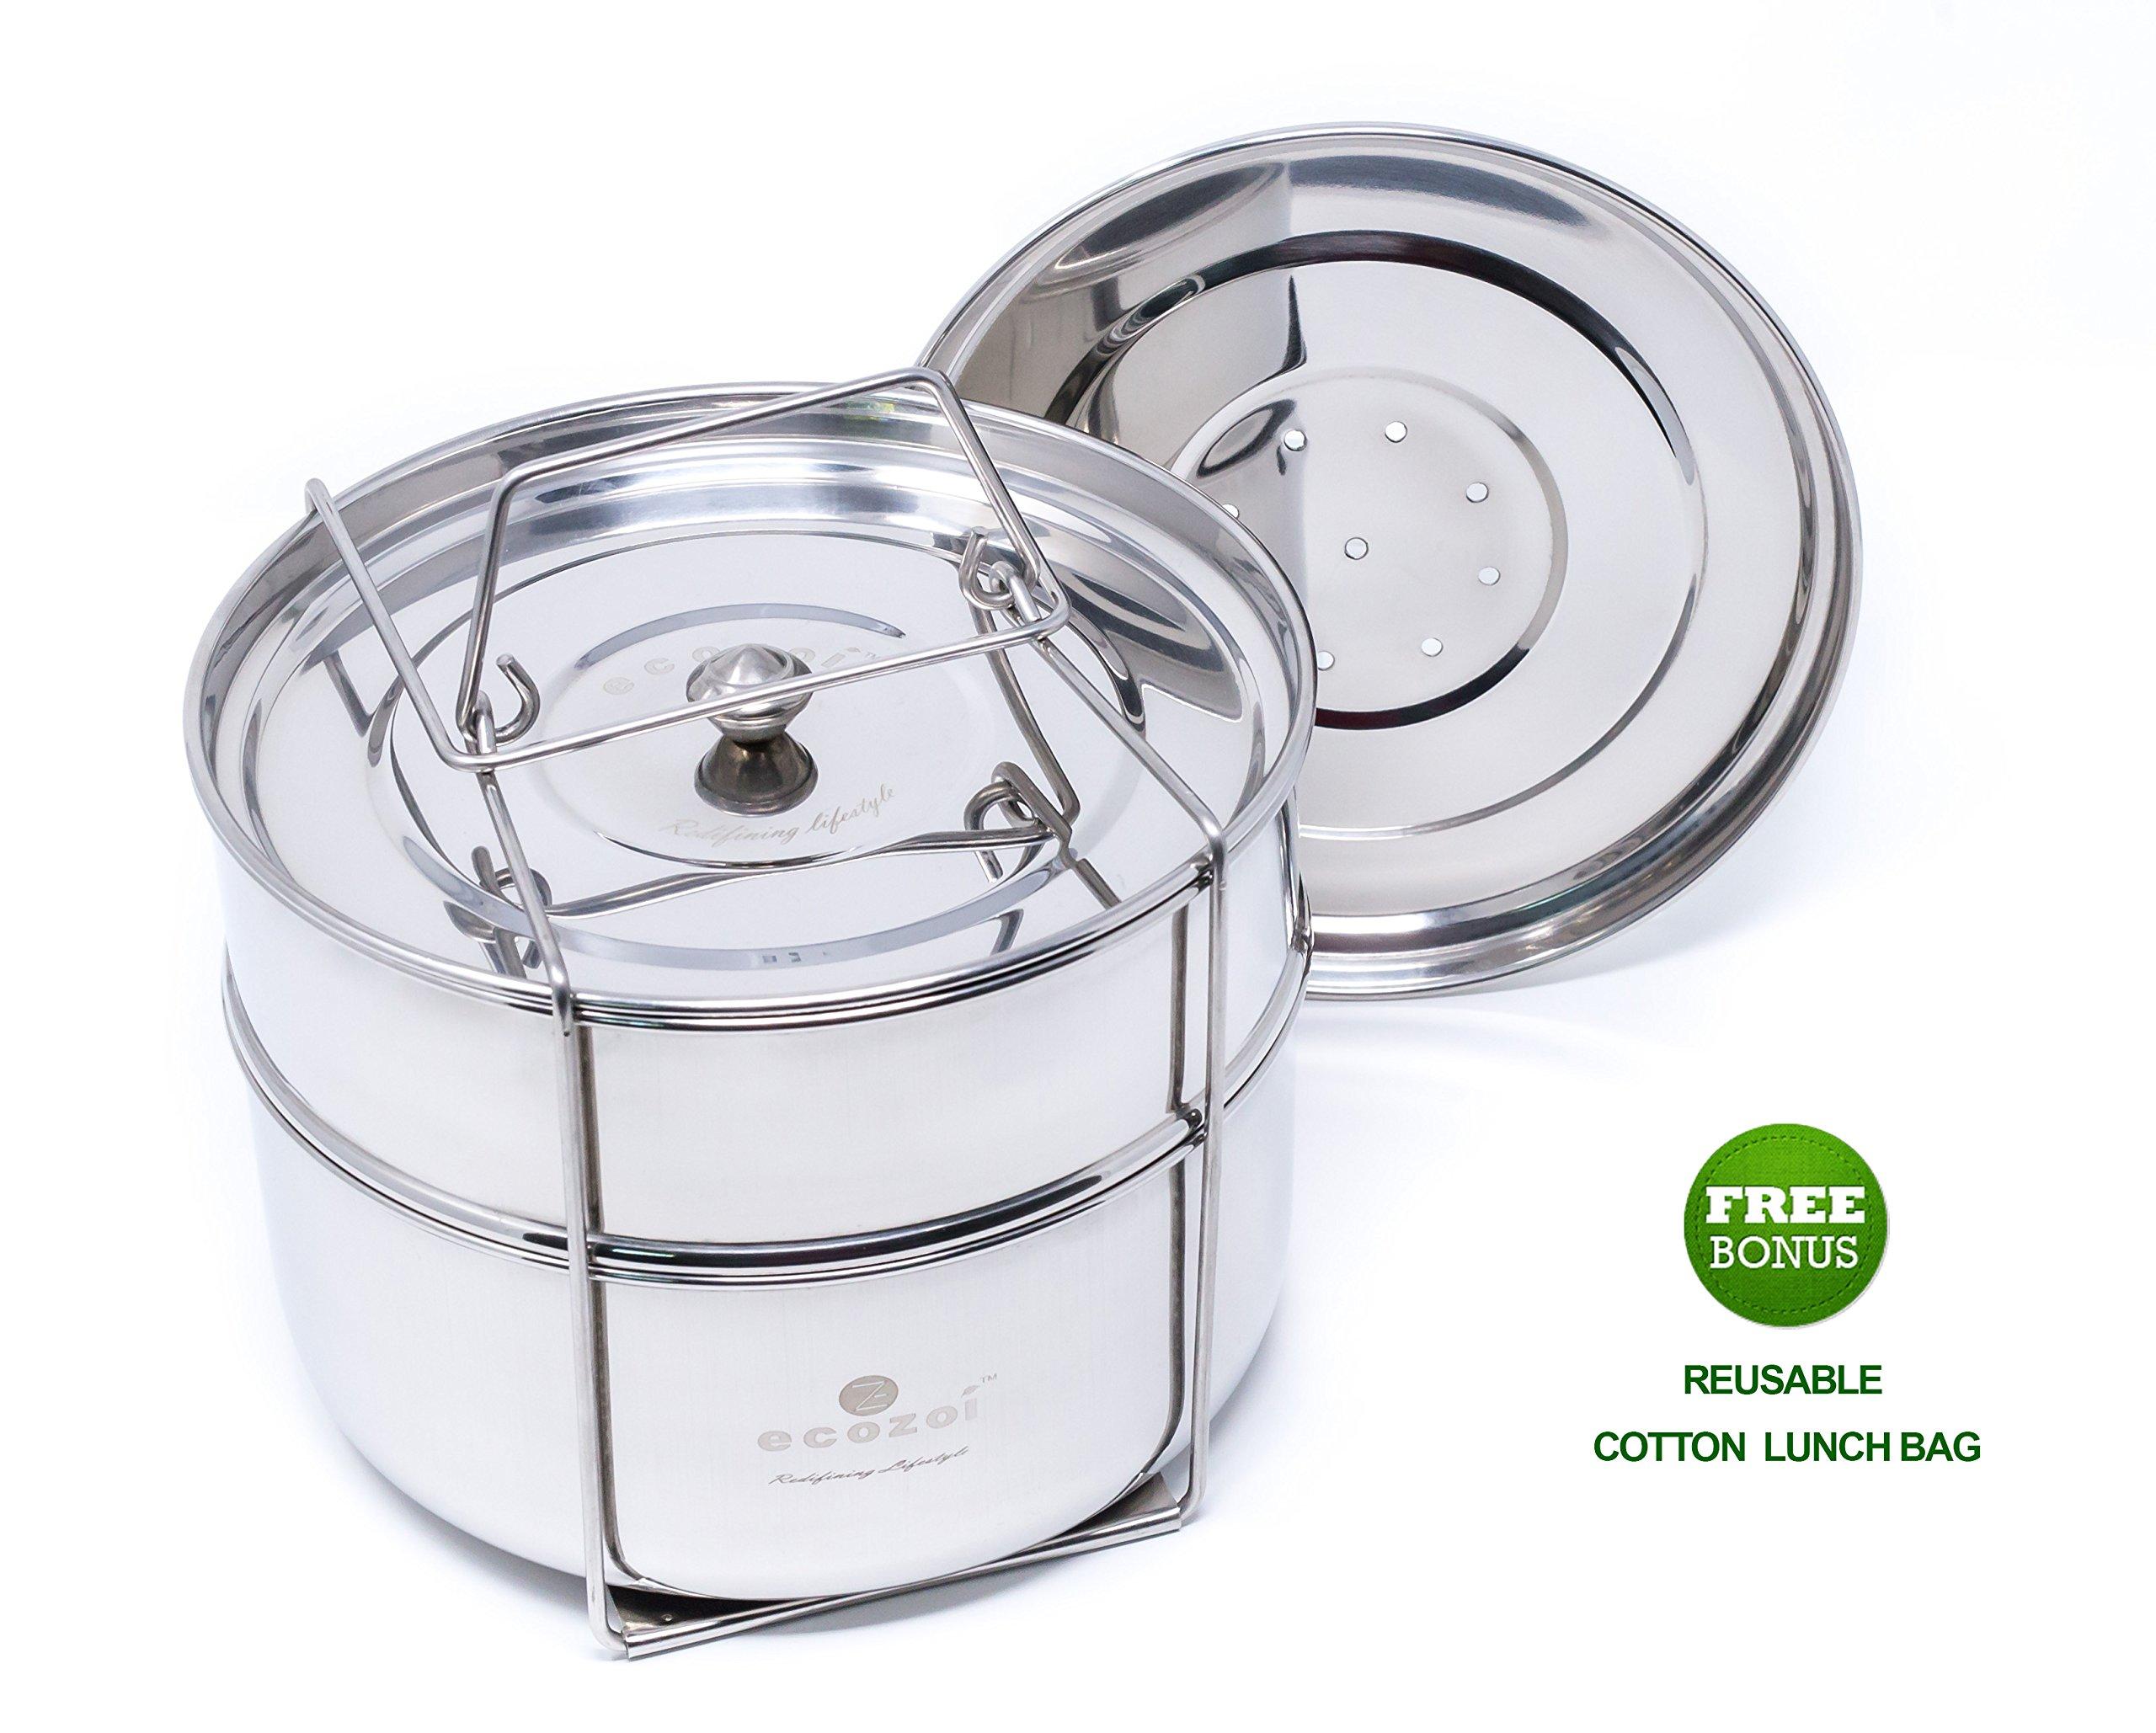 Ecozoi Premium Food Steamer Pot In Pot Insert Pans for 6, 8 Quart Instant Pot Accessories & Pressure Cookers - 2 Tier | Stackable PIP | Extra Deep | Interchangeble Lids + BONUS Reusable Lunch Bag